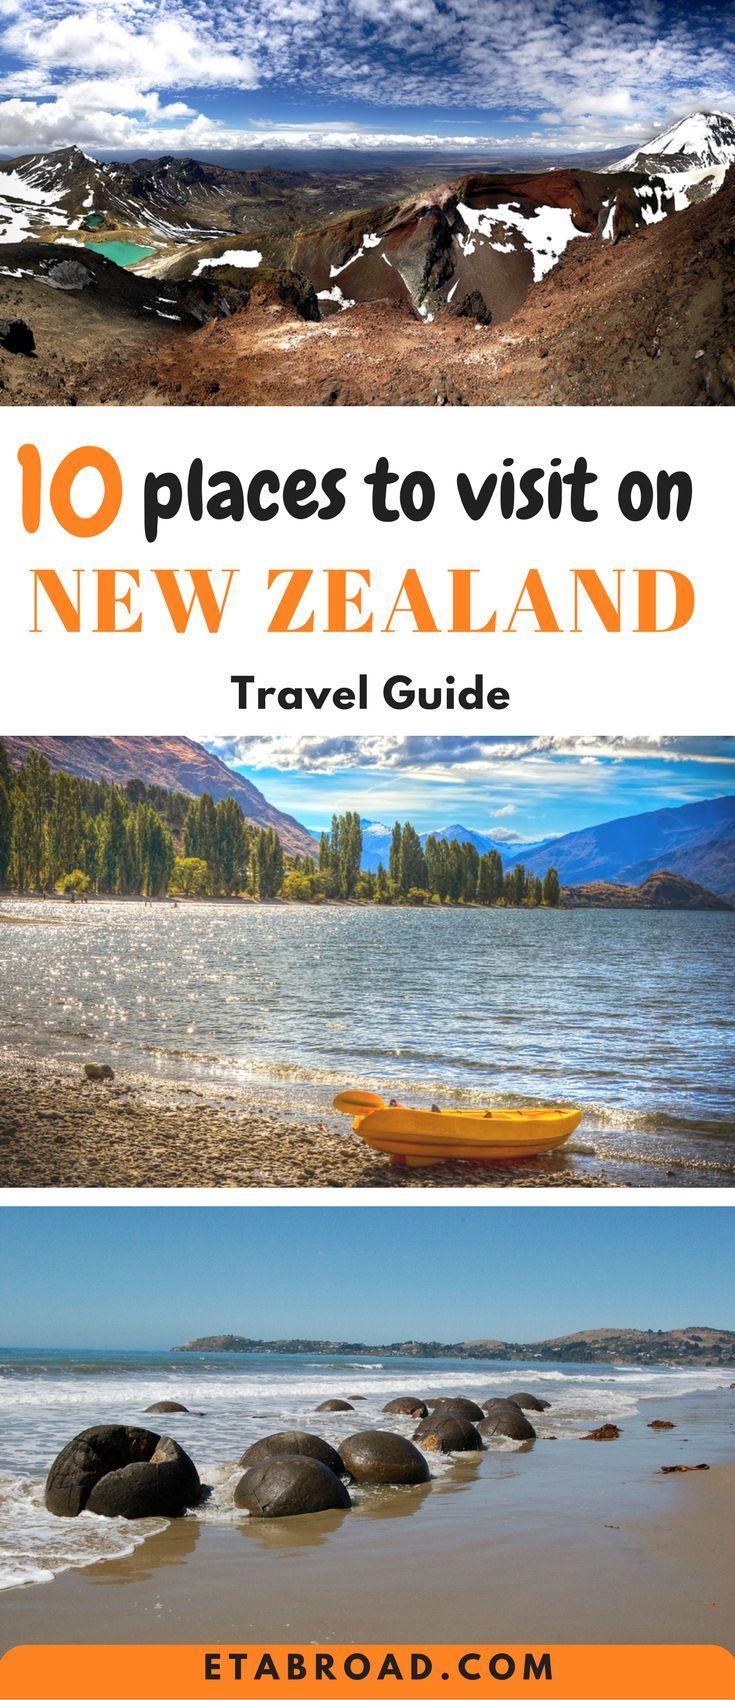 10 best place to visit on New Zeland - Maoraki boulders, Urewera national park, Lake Wanaka, Milford Sound, Lake Tekapo, Golden bay, Arthur´s pass national park, Fox & Franz Josef Glacier, Rotorura, Tongario national park | #NewZealand #travel #bucketlist #wanderlust